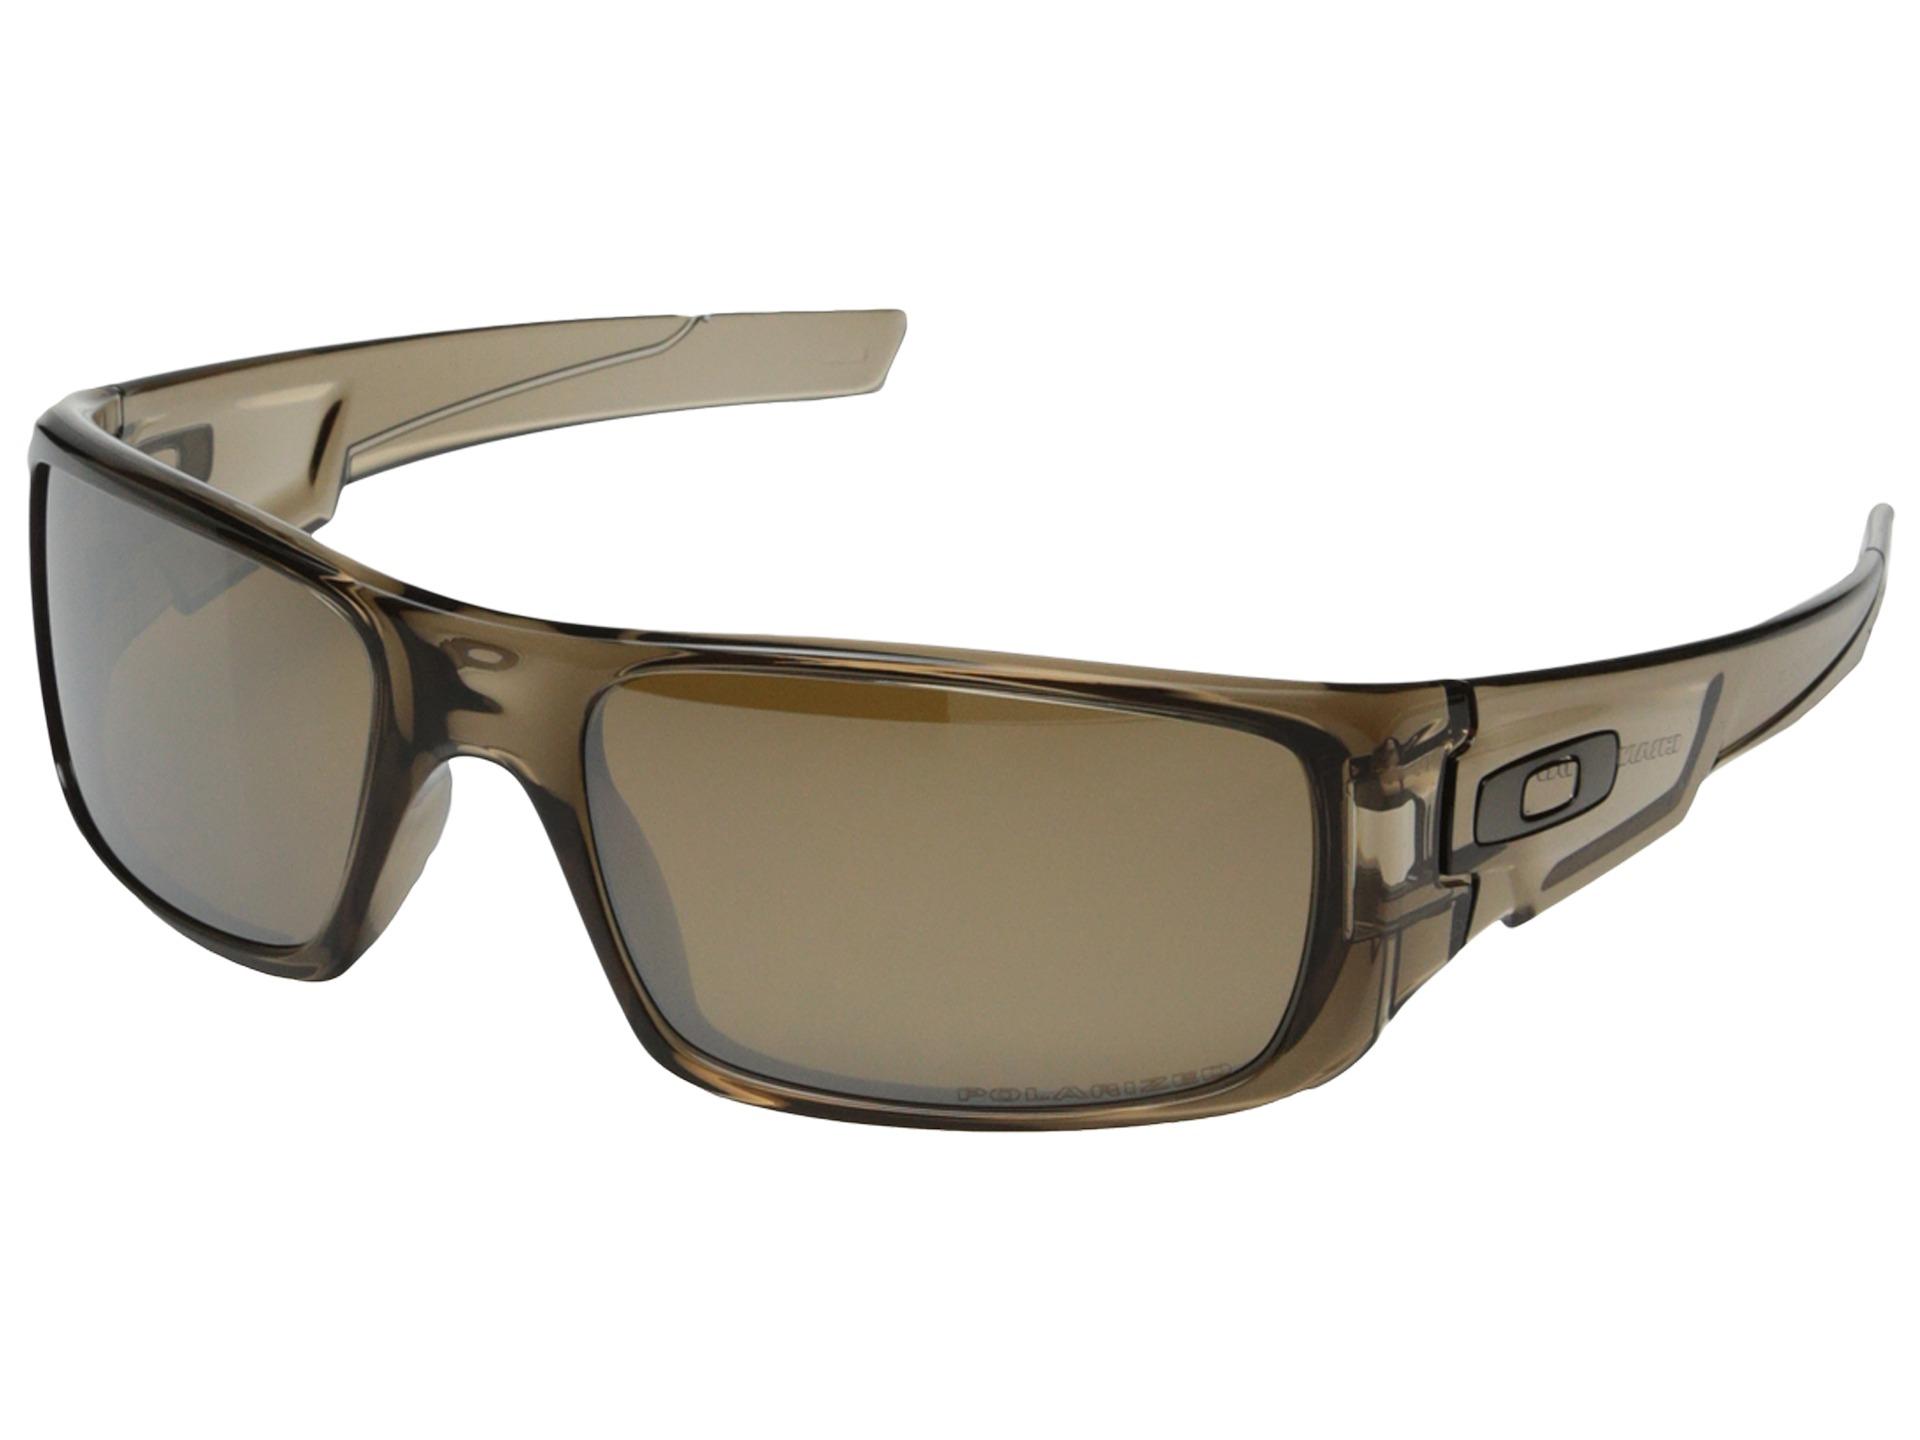 Oakley Valve Sunglasses Review  oakley crankshaft zappos com free shipping both ways